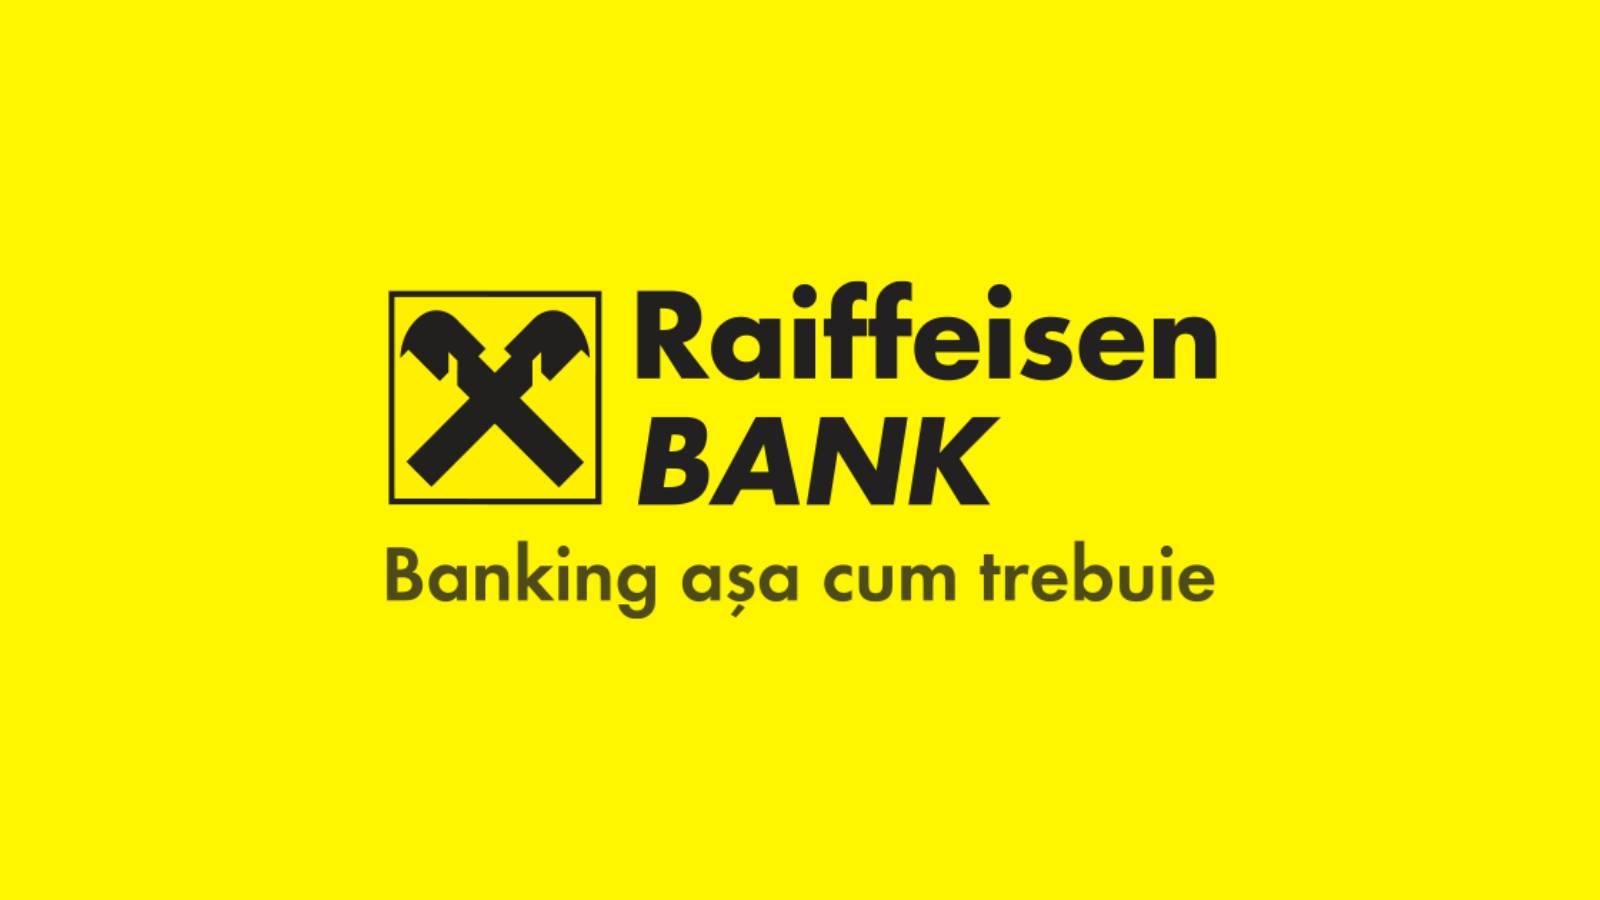 Raiffeisen Bank casian